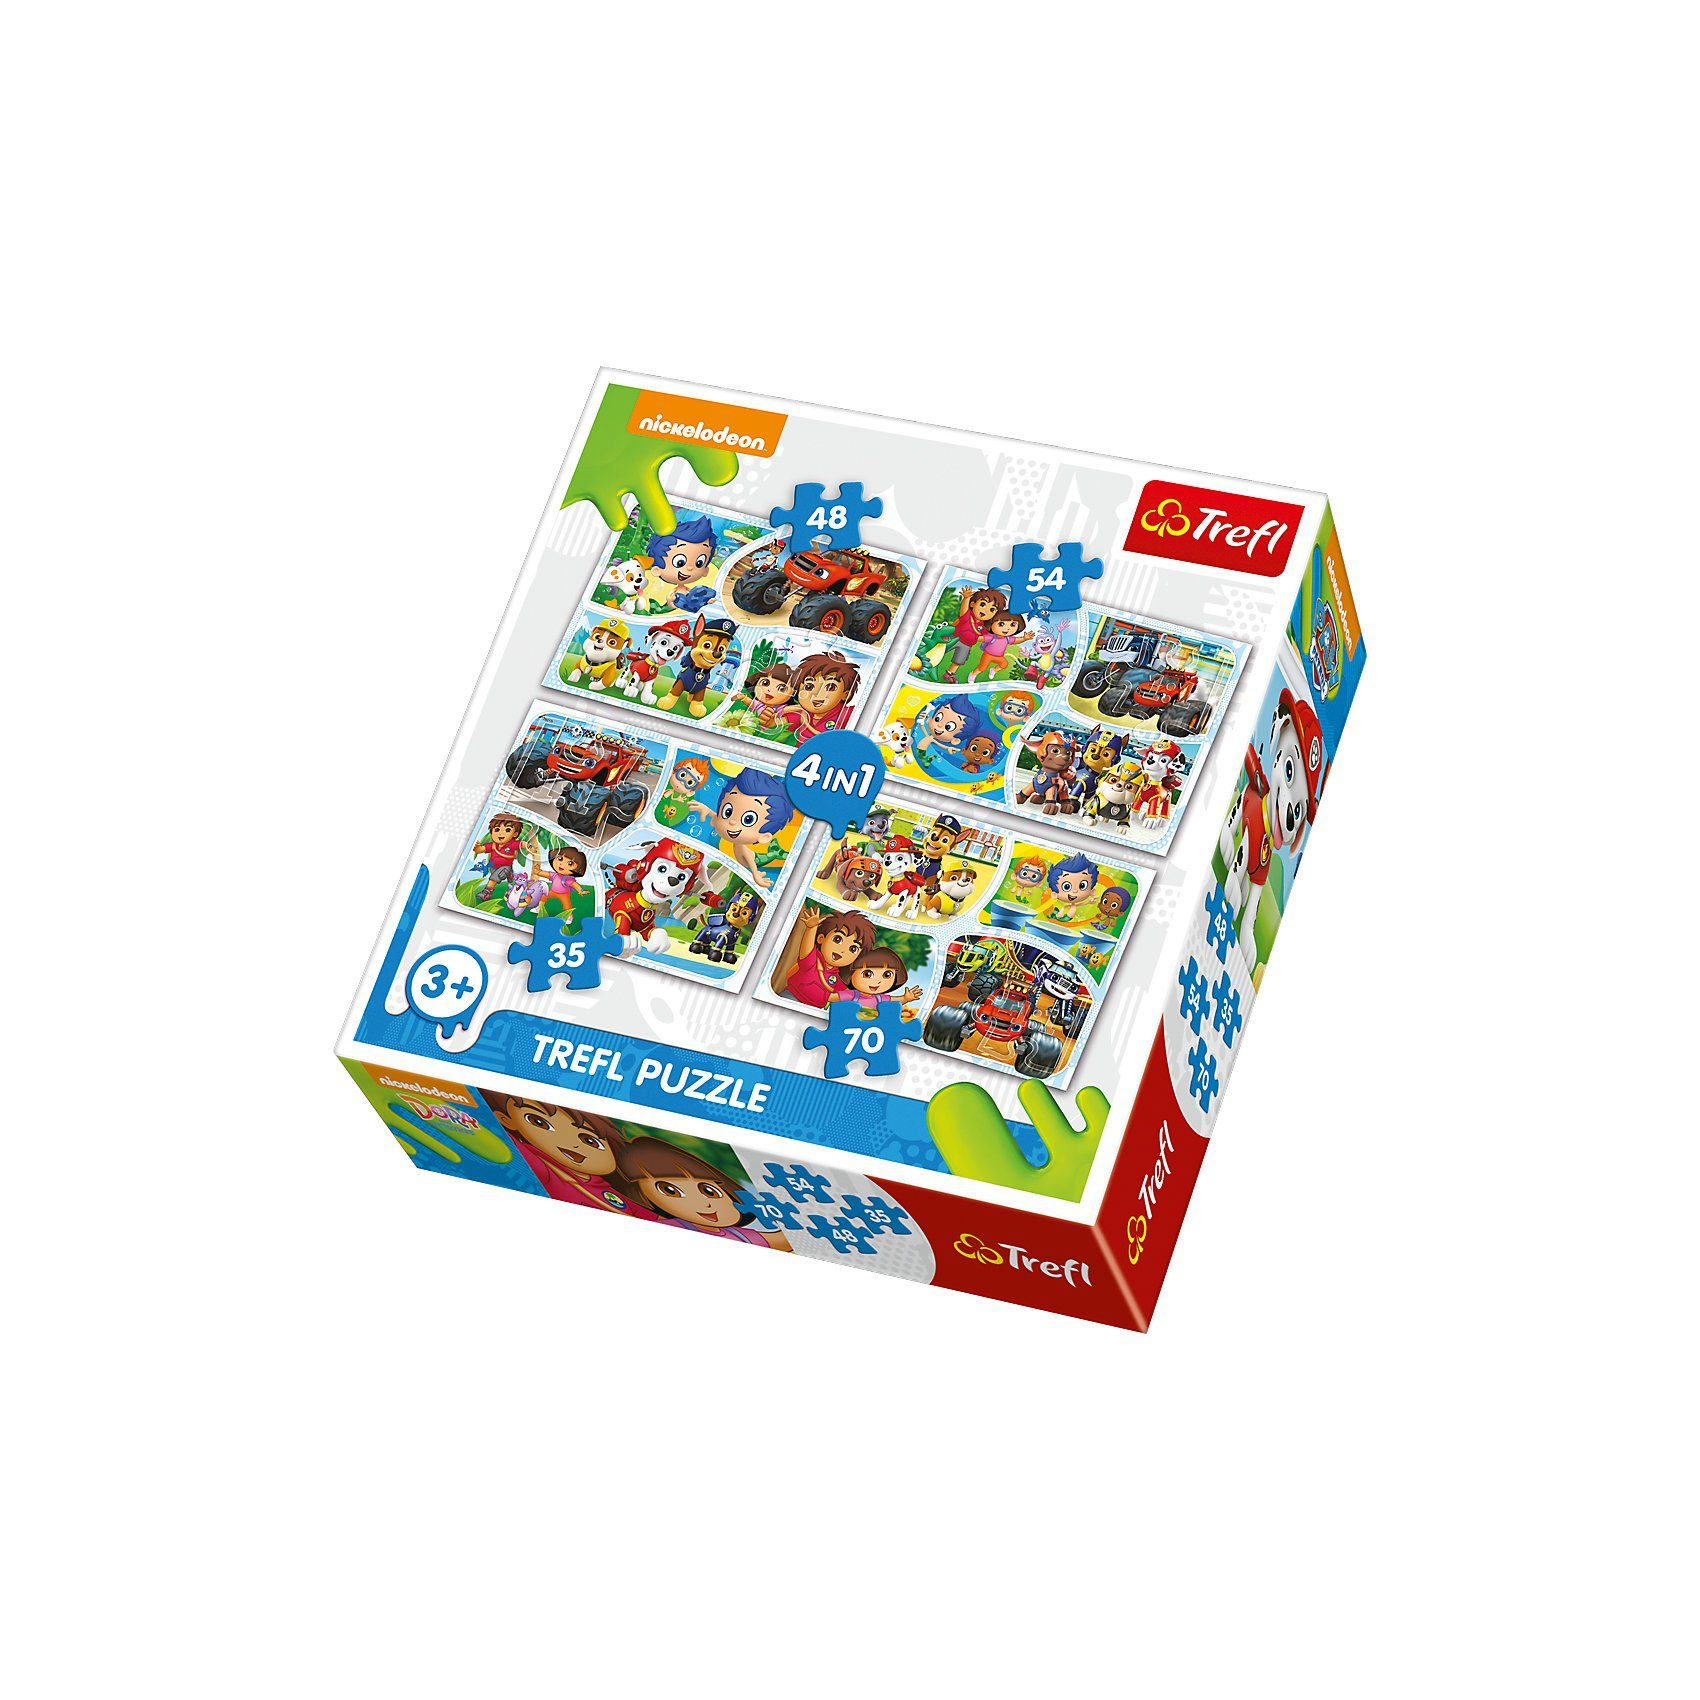 Trefl 4in1 Puzzle - Nickelodeon (35/48/54/70 Teile)